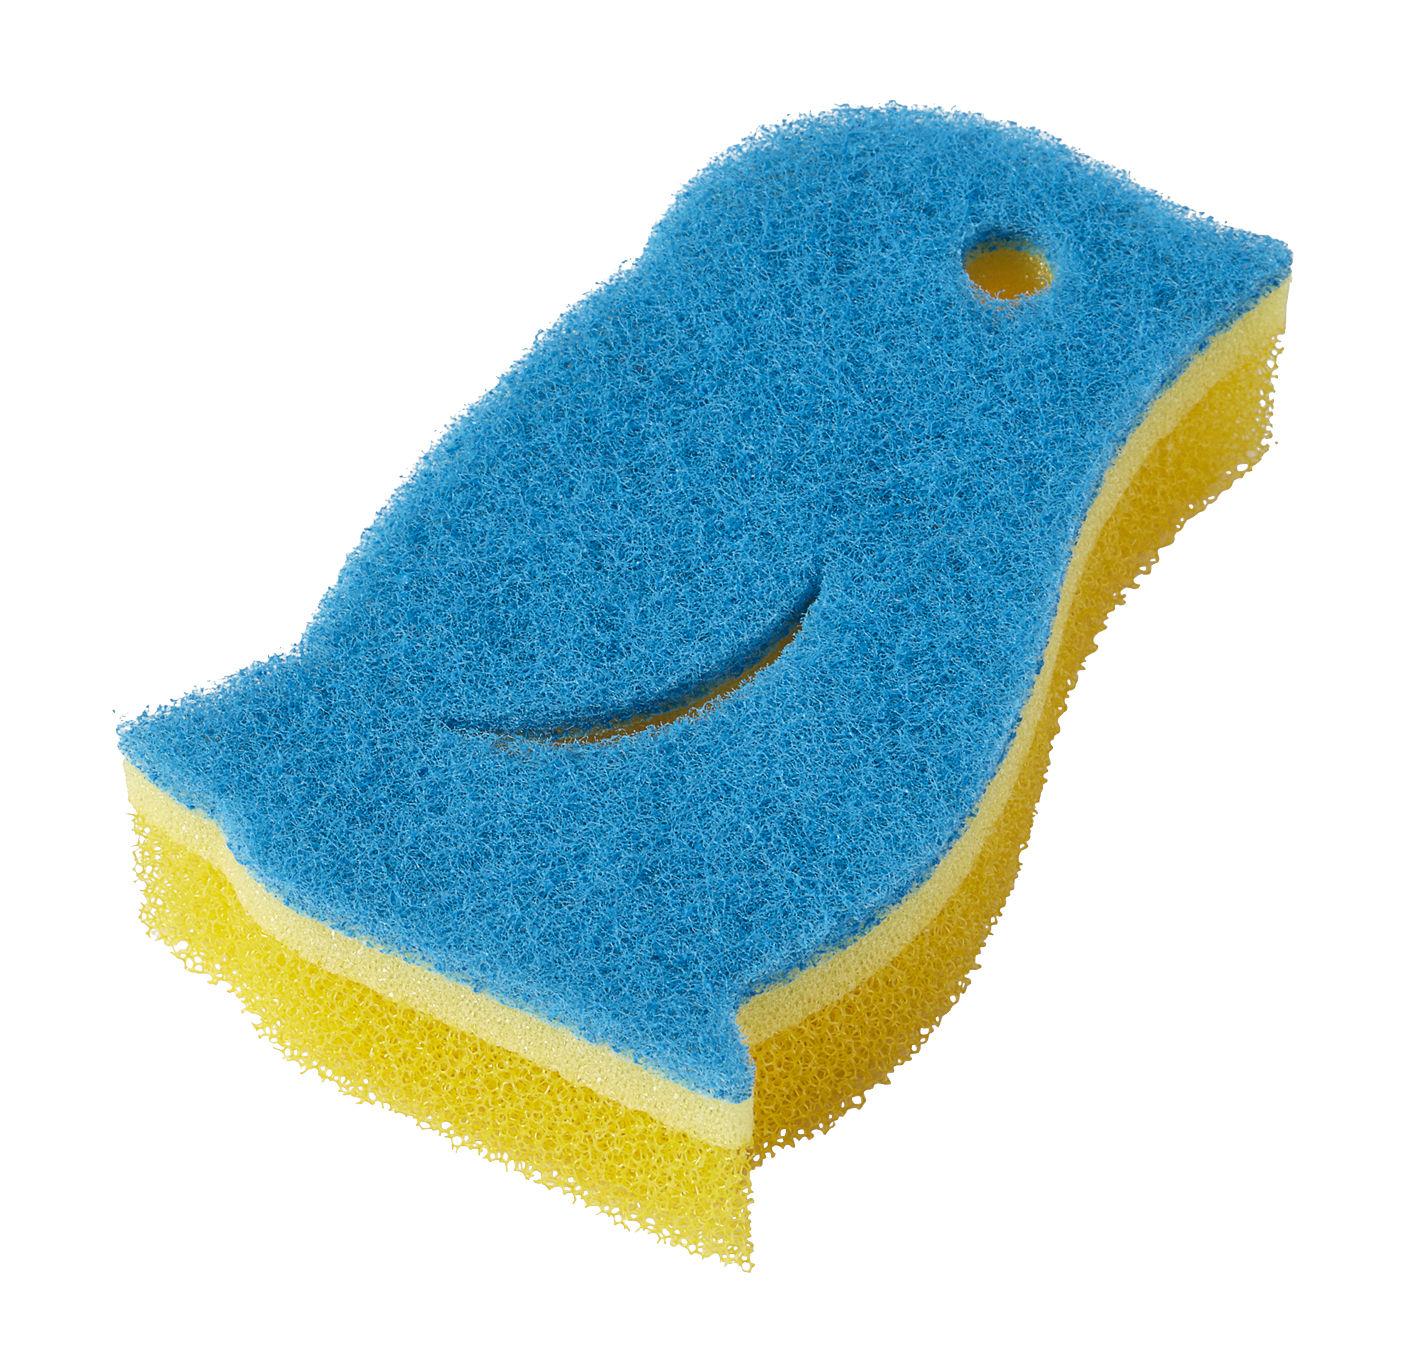 Accessories - Bathroom Accessories - Pingouin Sponge by Hay - Penguin - Polyurethane foam